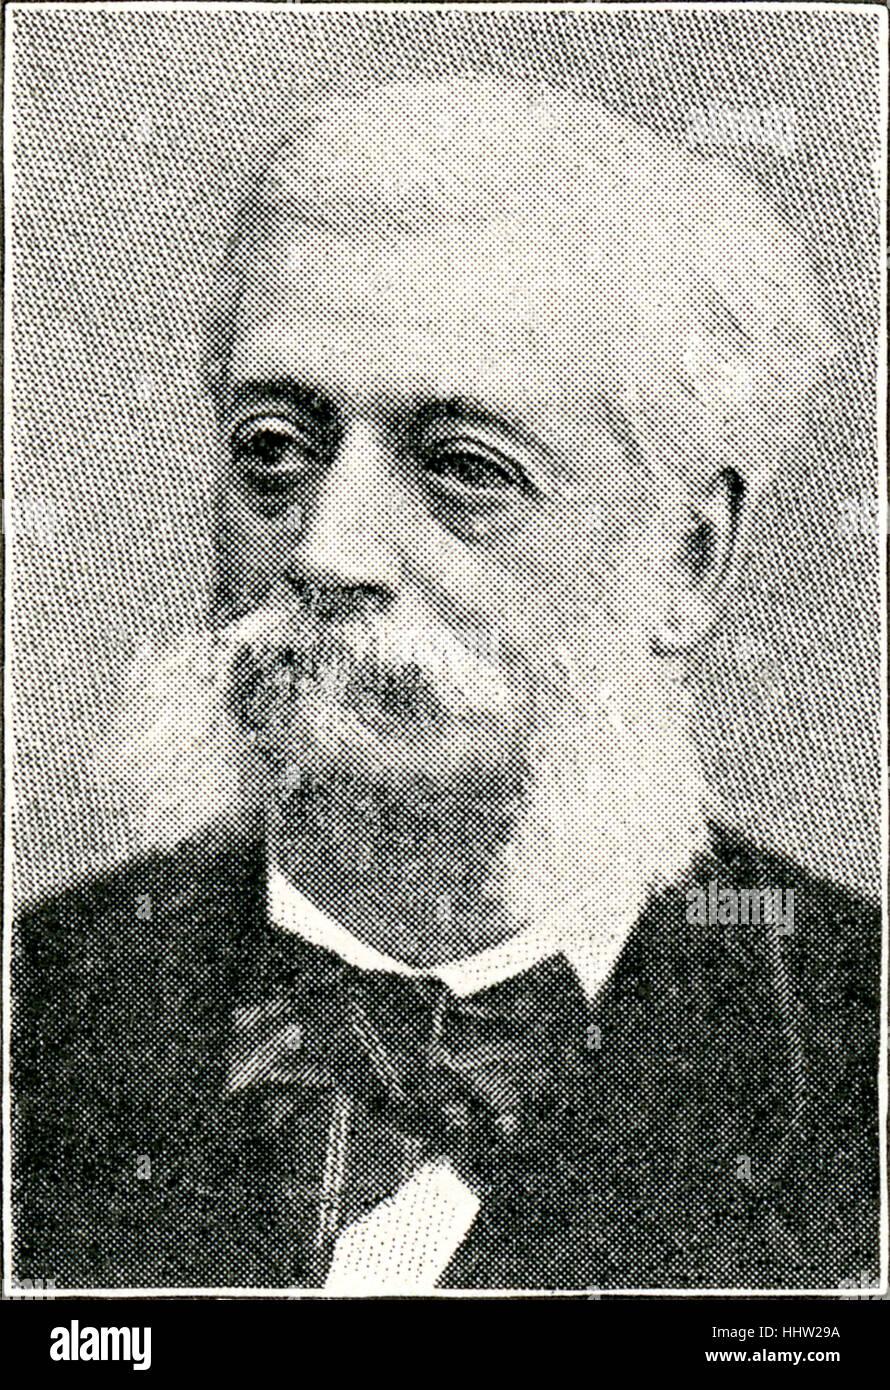 Baron Alphonse de Rothschild, French financier and philanthropist. 1 February 1827 - 26 May 1905. - Stock Image